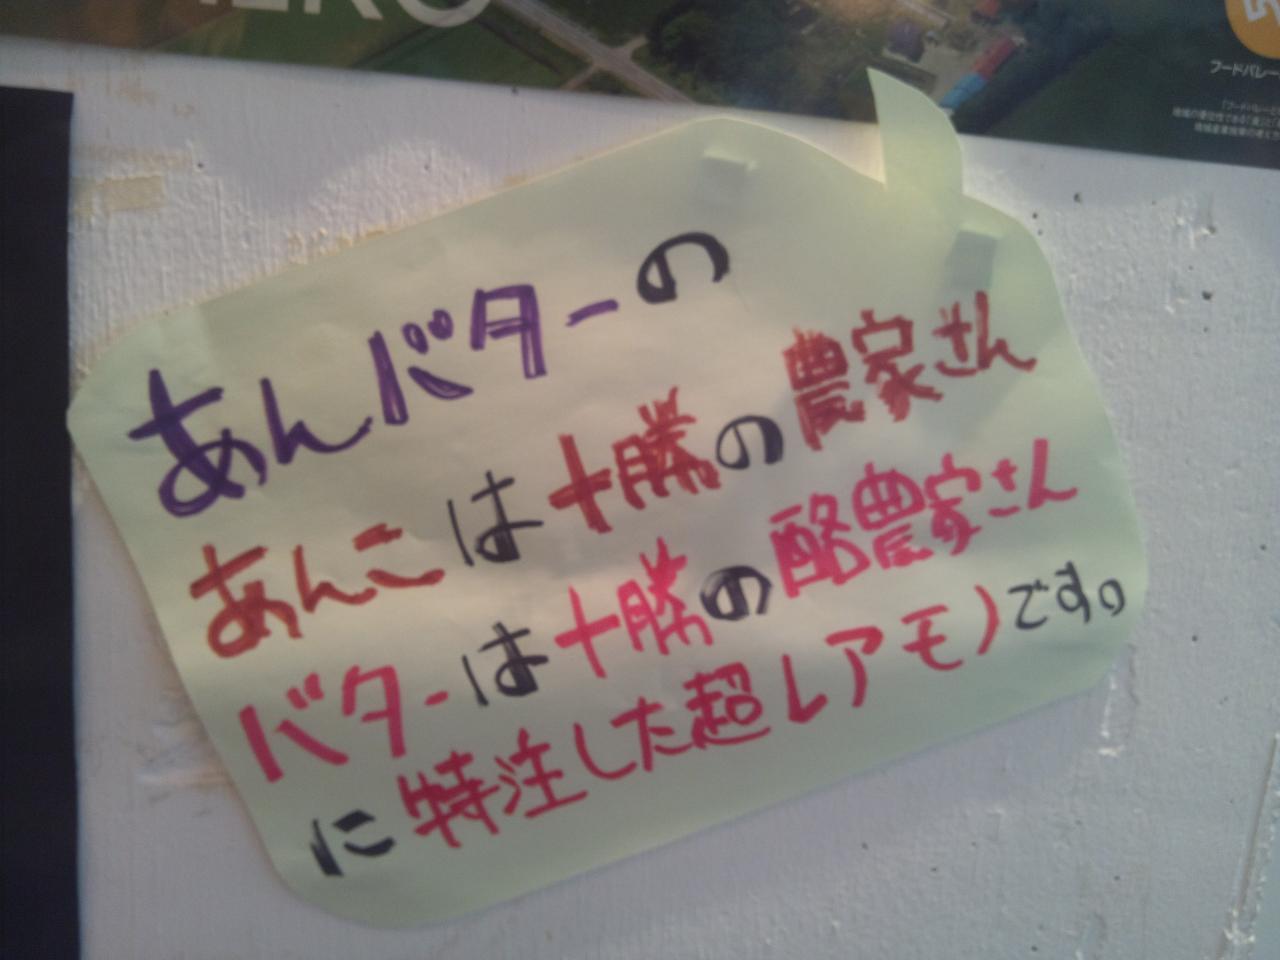 BLUE_CORNER(ポスター)